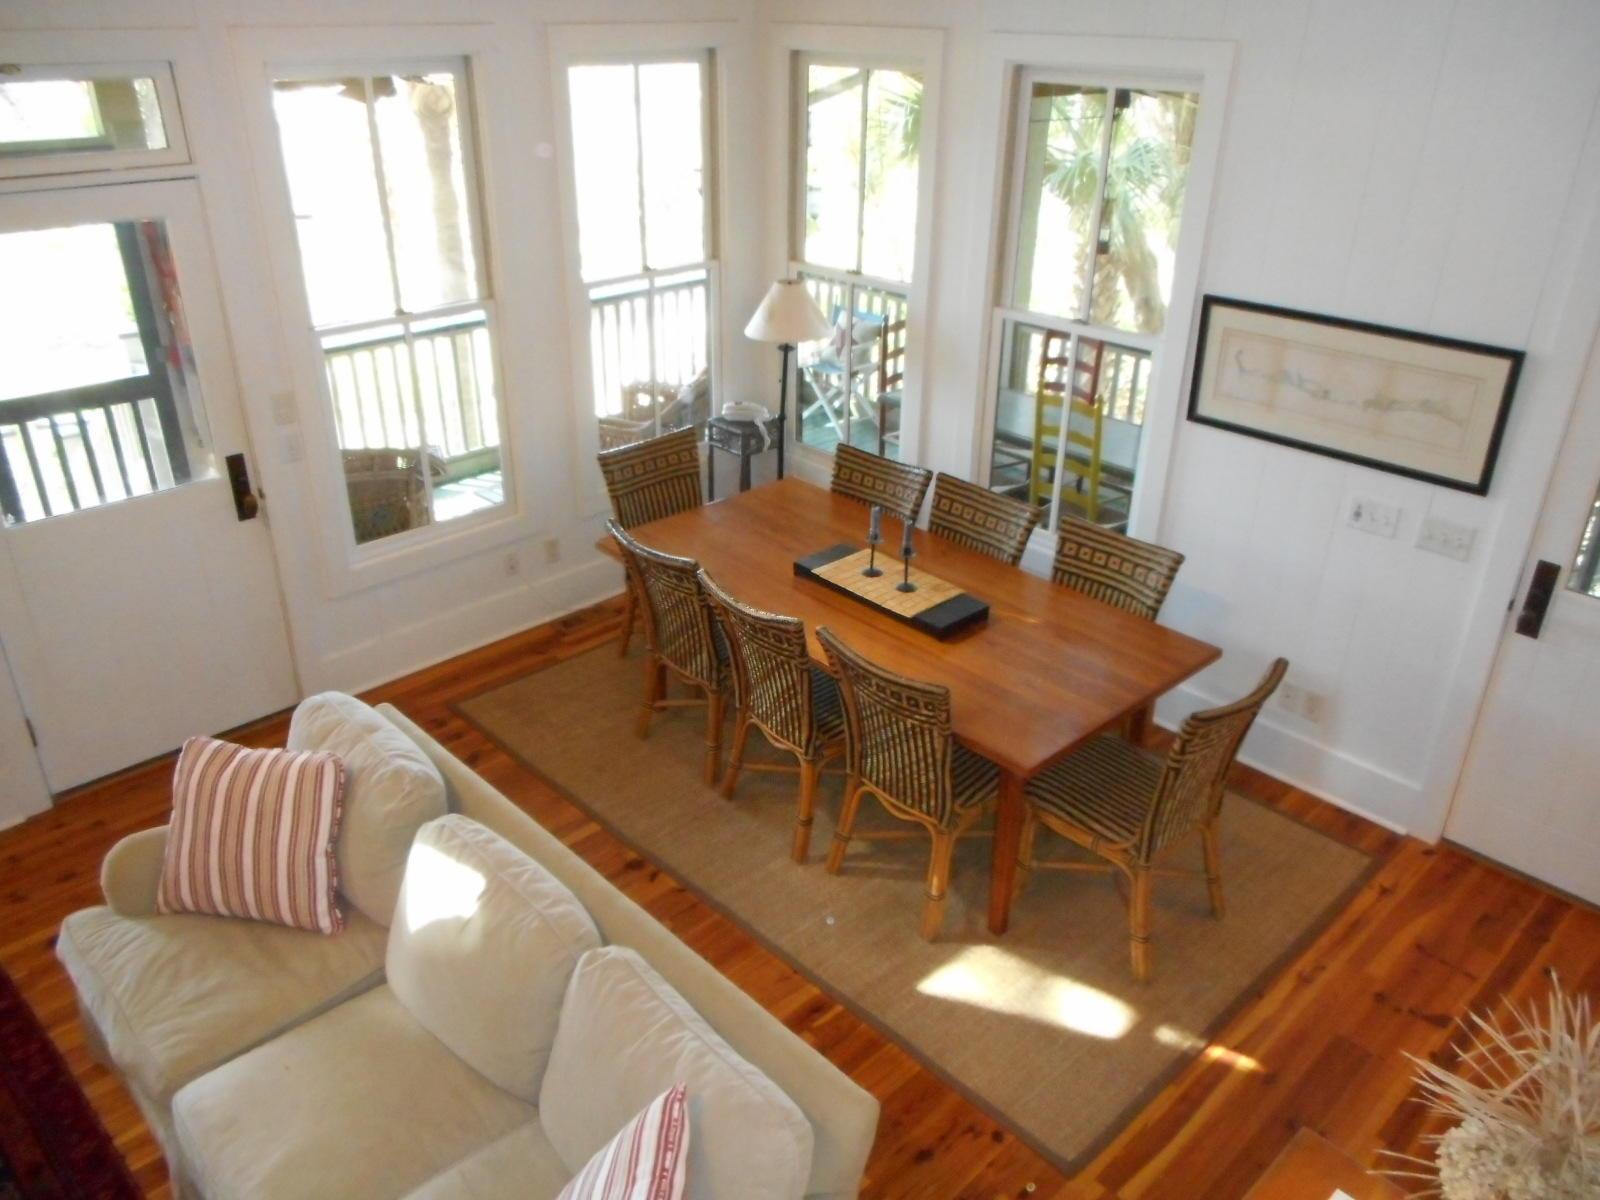 Bailey Island Club Homes For Sale - 2145 Bailey Island, Edisto Island, SC - 3